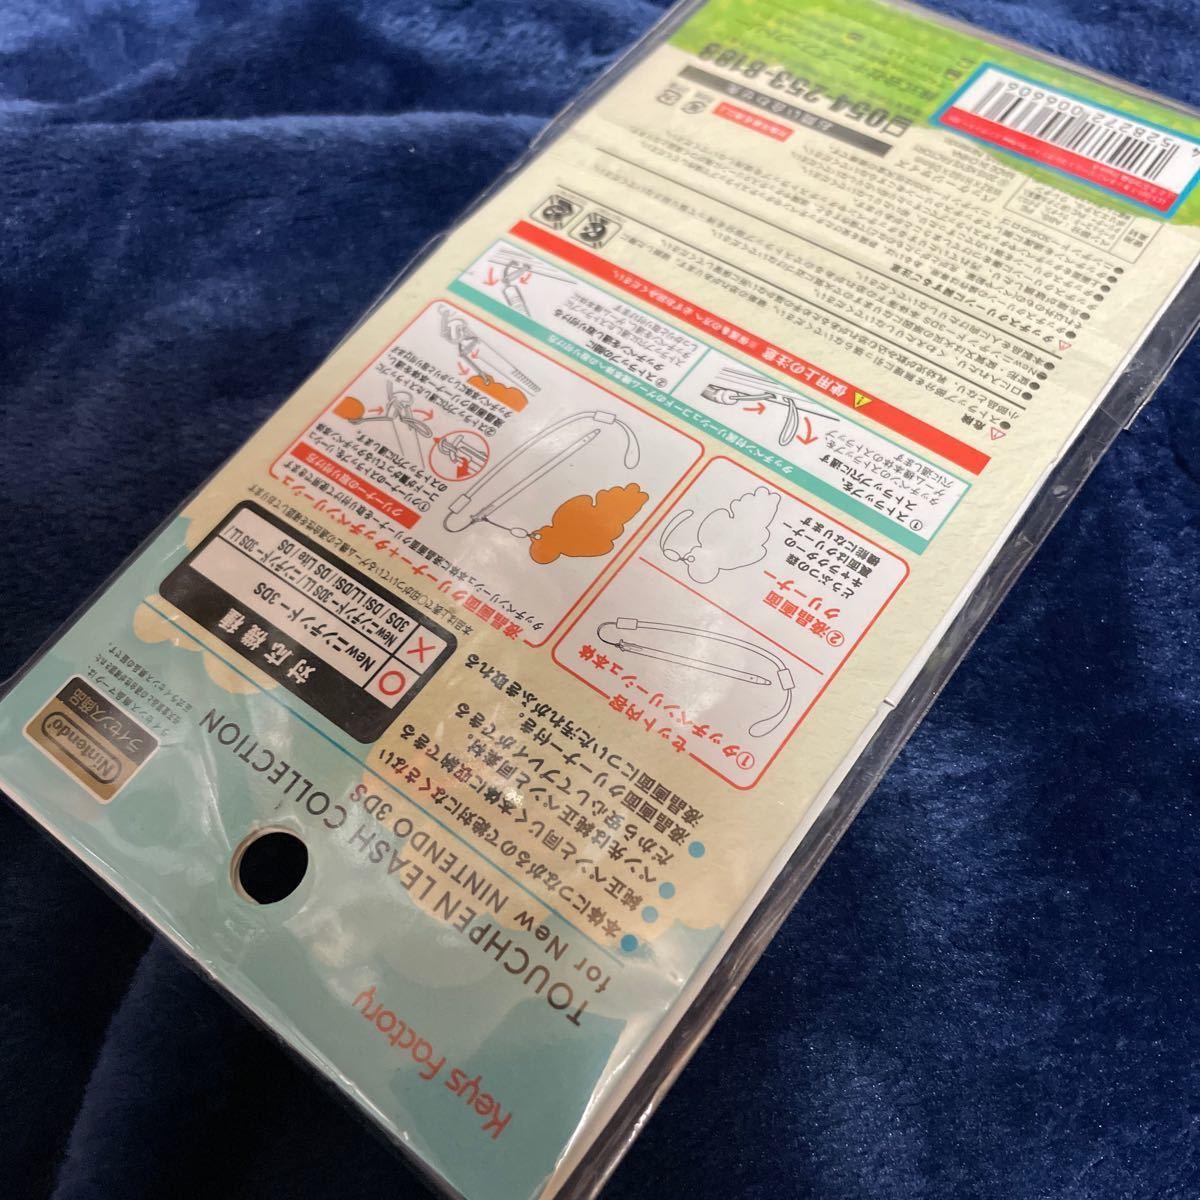 Newニンテンドー3DS あつ森 どうぶつの森タッチペン&液晶クリーナー送料無料 新品 4-2